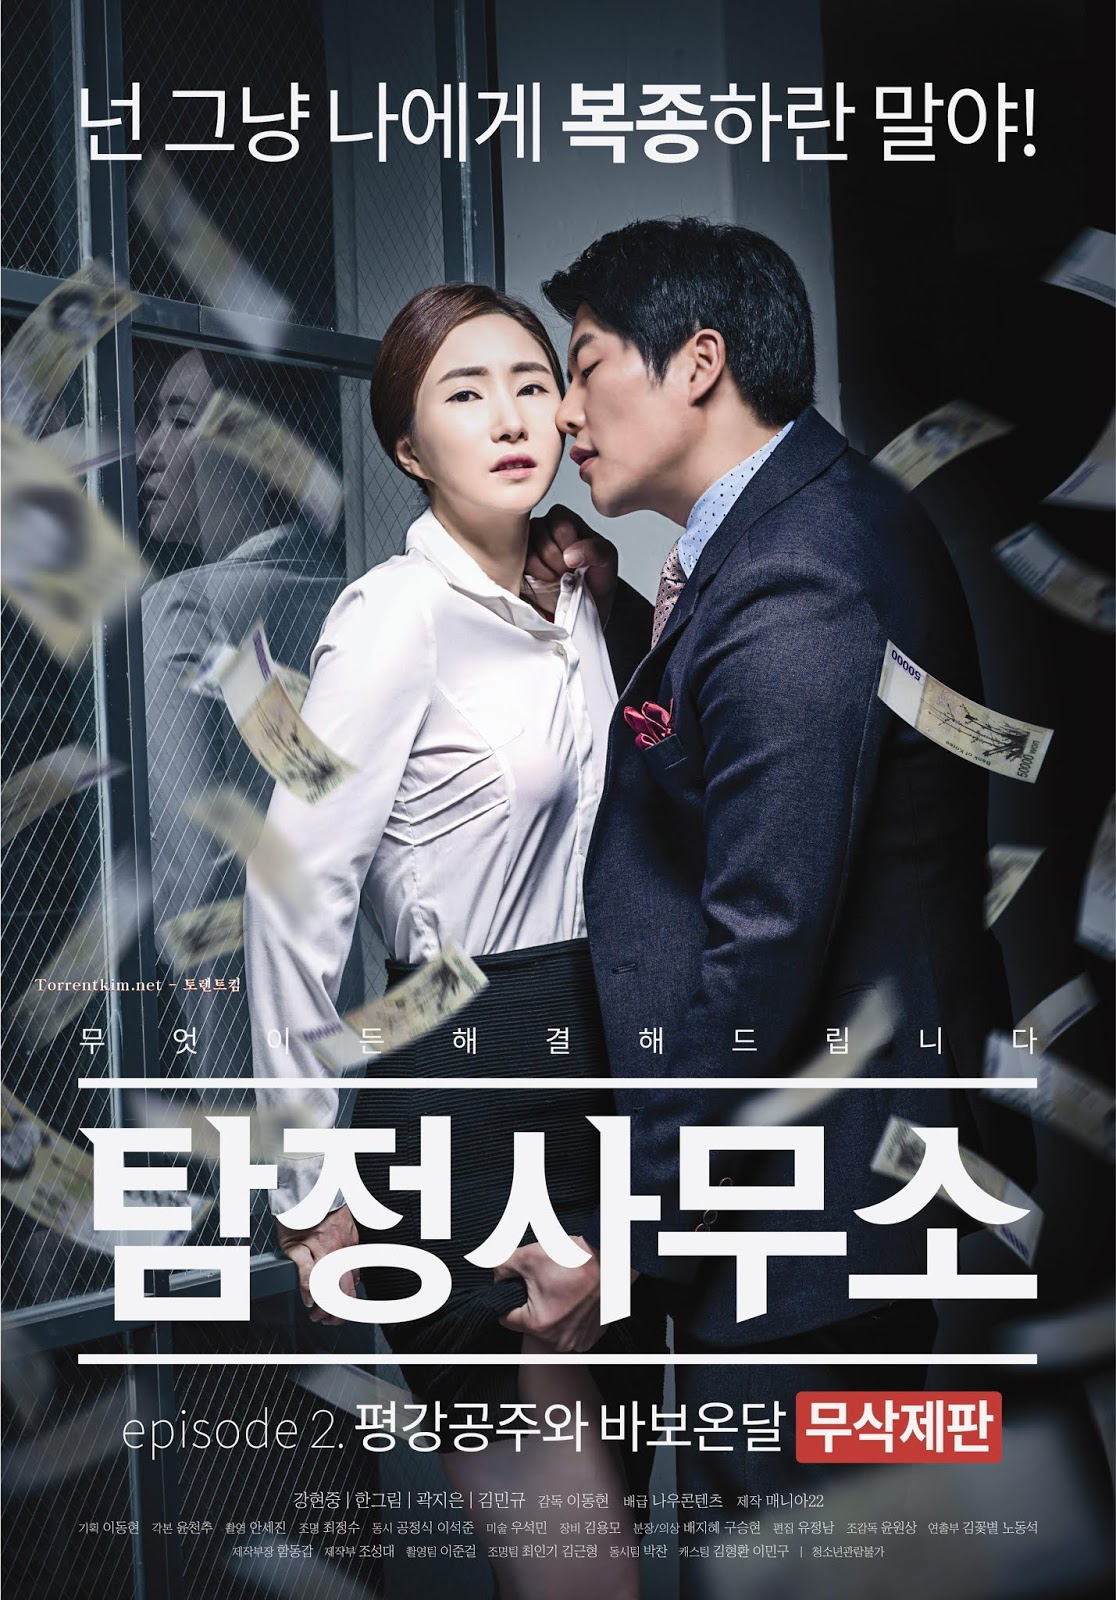 Detective Agency Full Korea Adult 18+ Movie Online